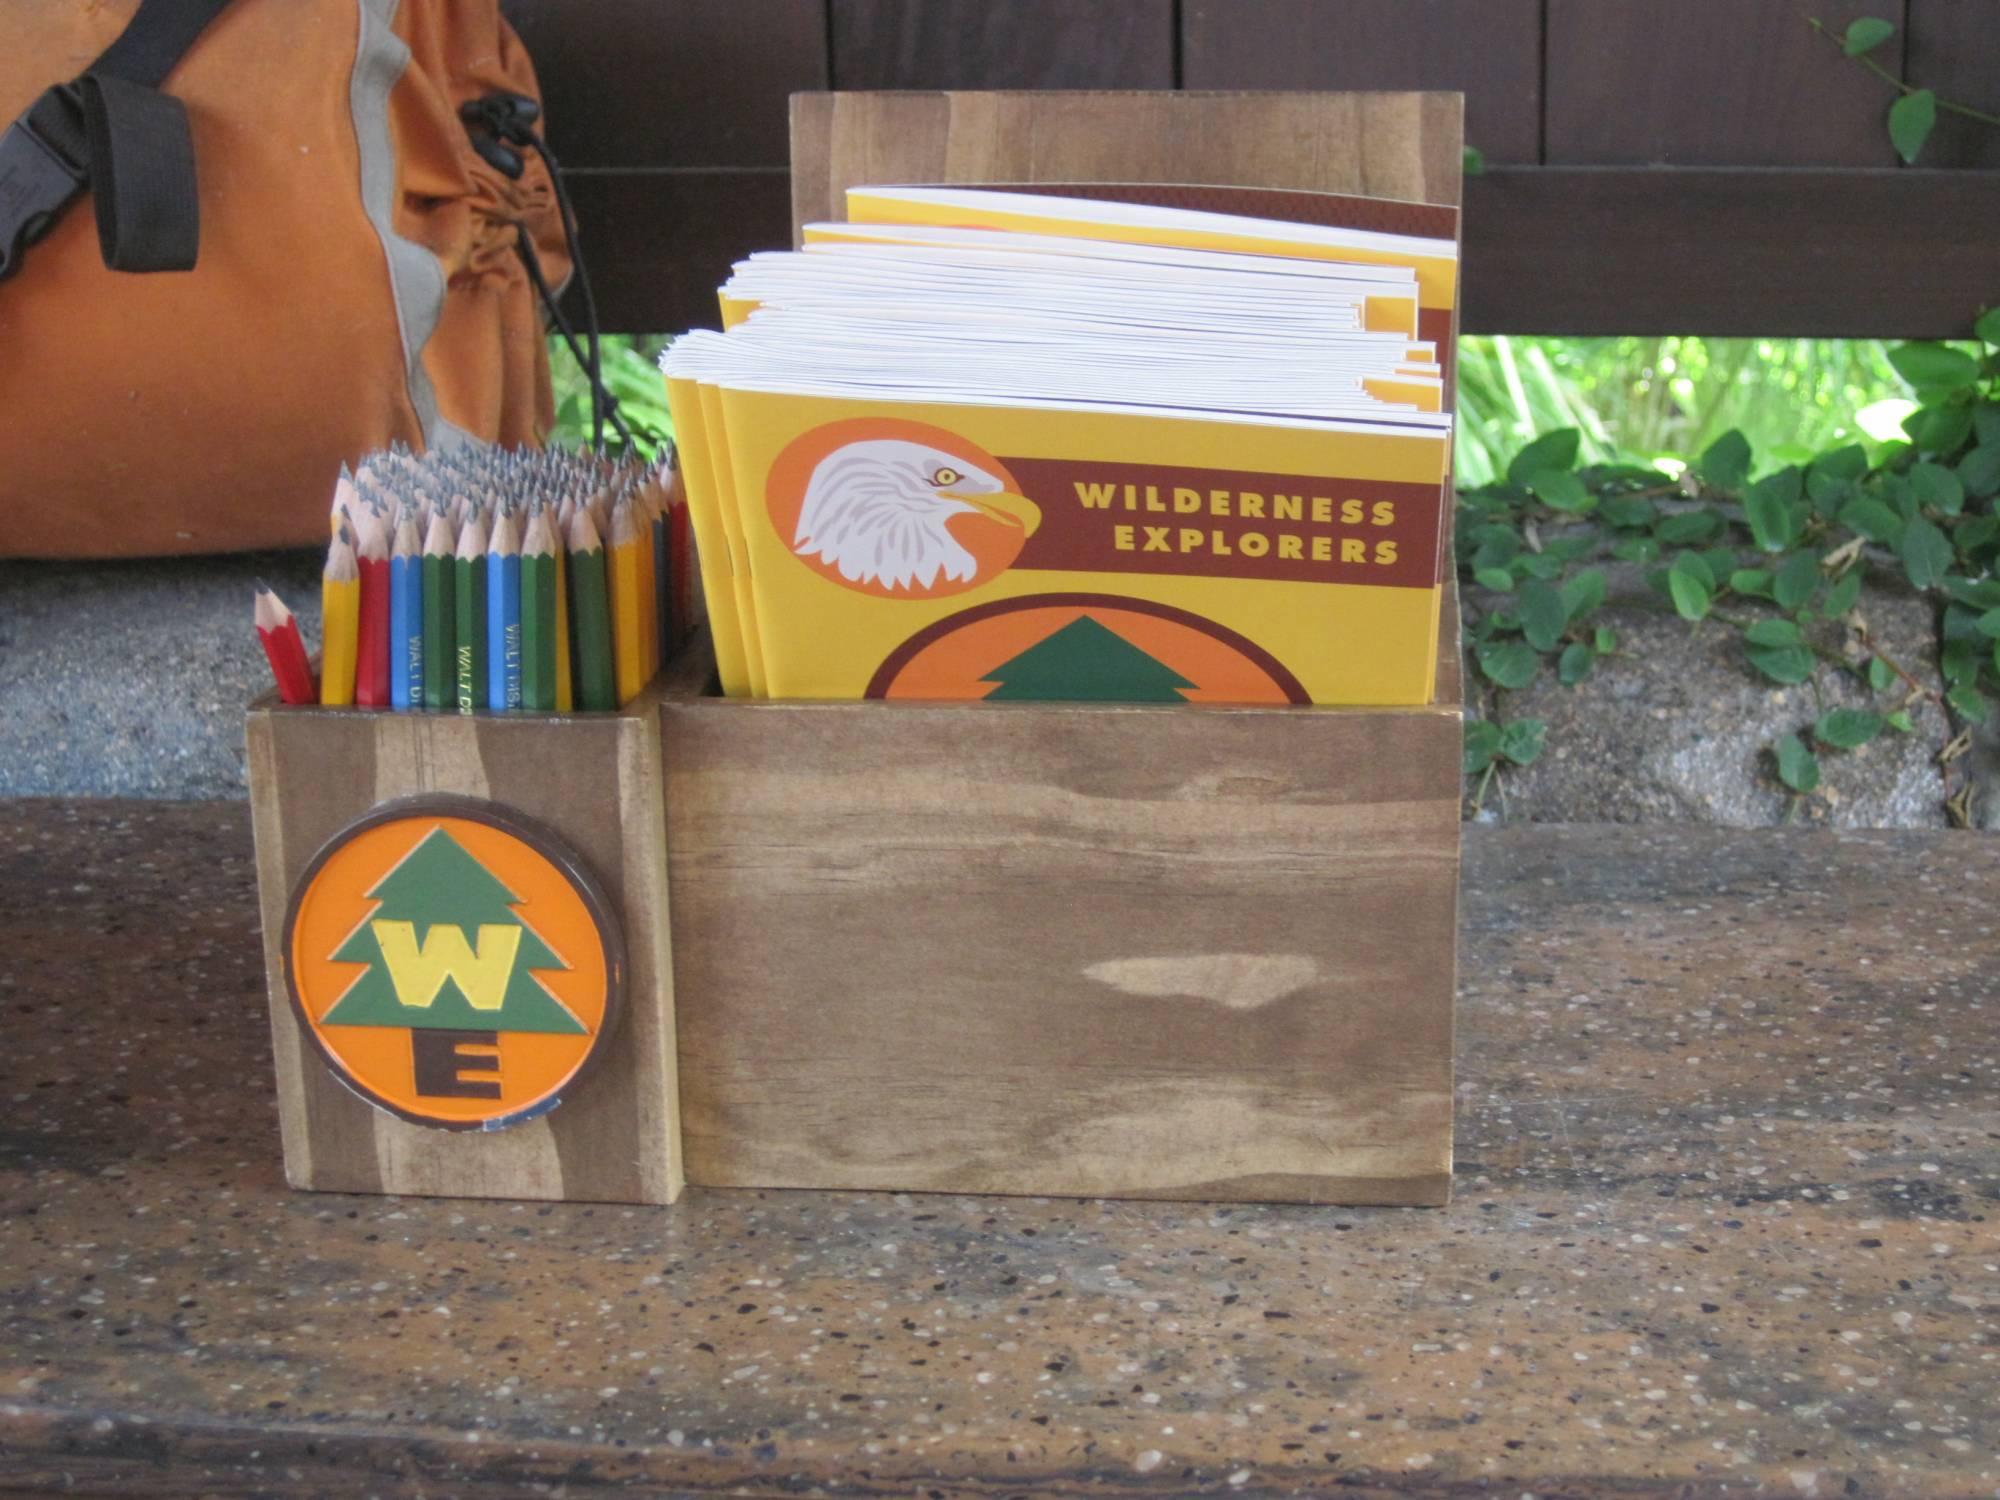 Earn your merit badges doing the Wilderness Explorers Adventure at Disney's Animal Kingdom | PassPorter.com